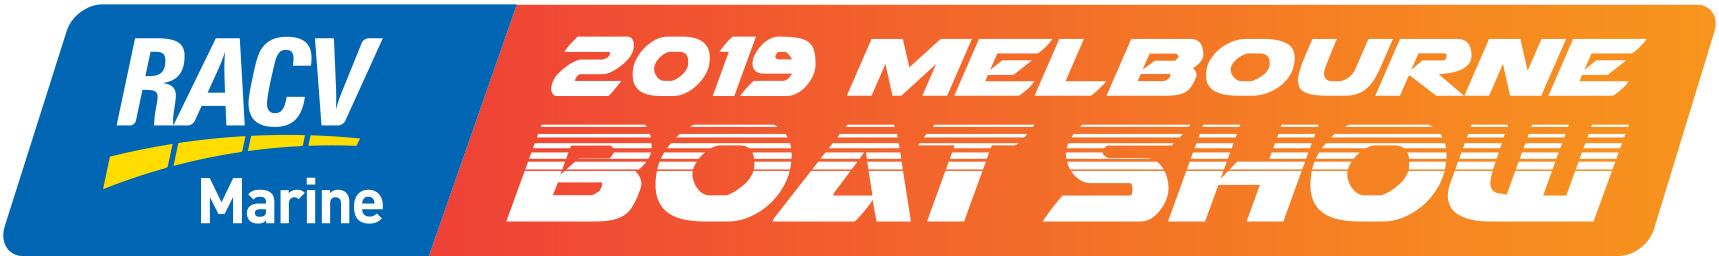 RACV 2019 Melb Boat Show Lock Up Logo.jpg